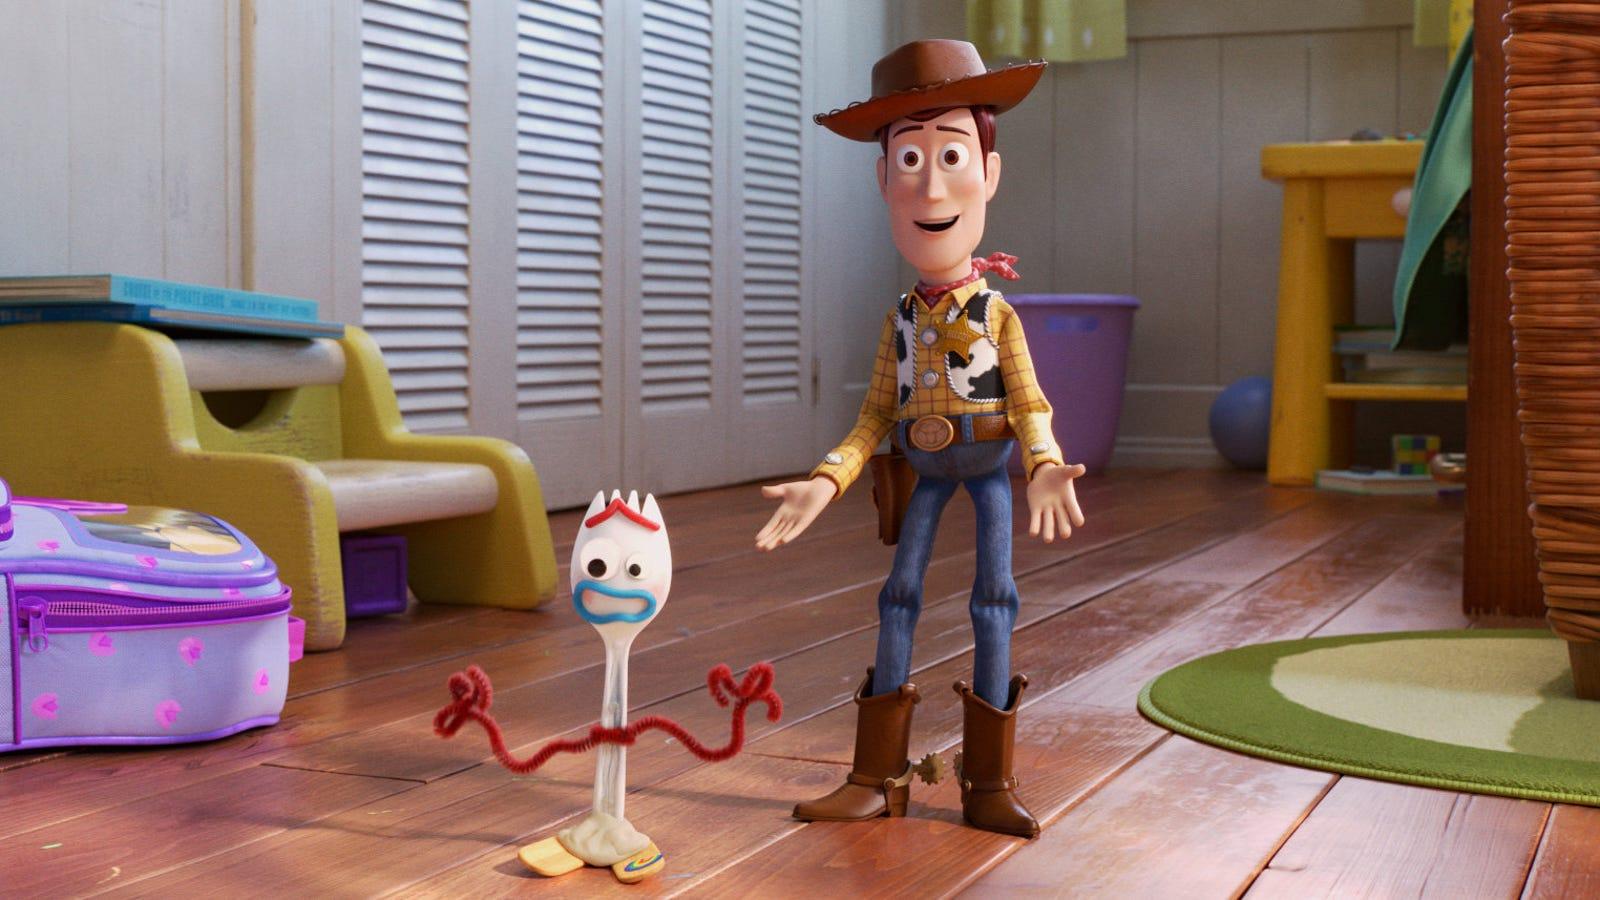 Disney just scored another damn billion dollar movie